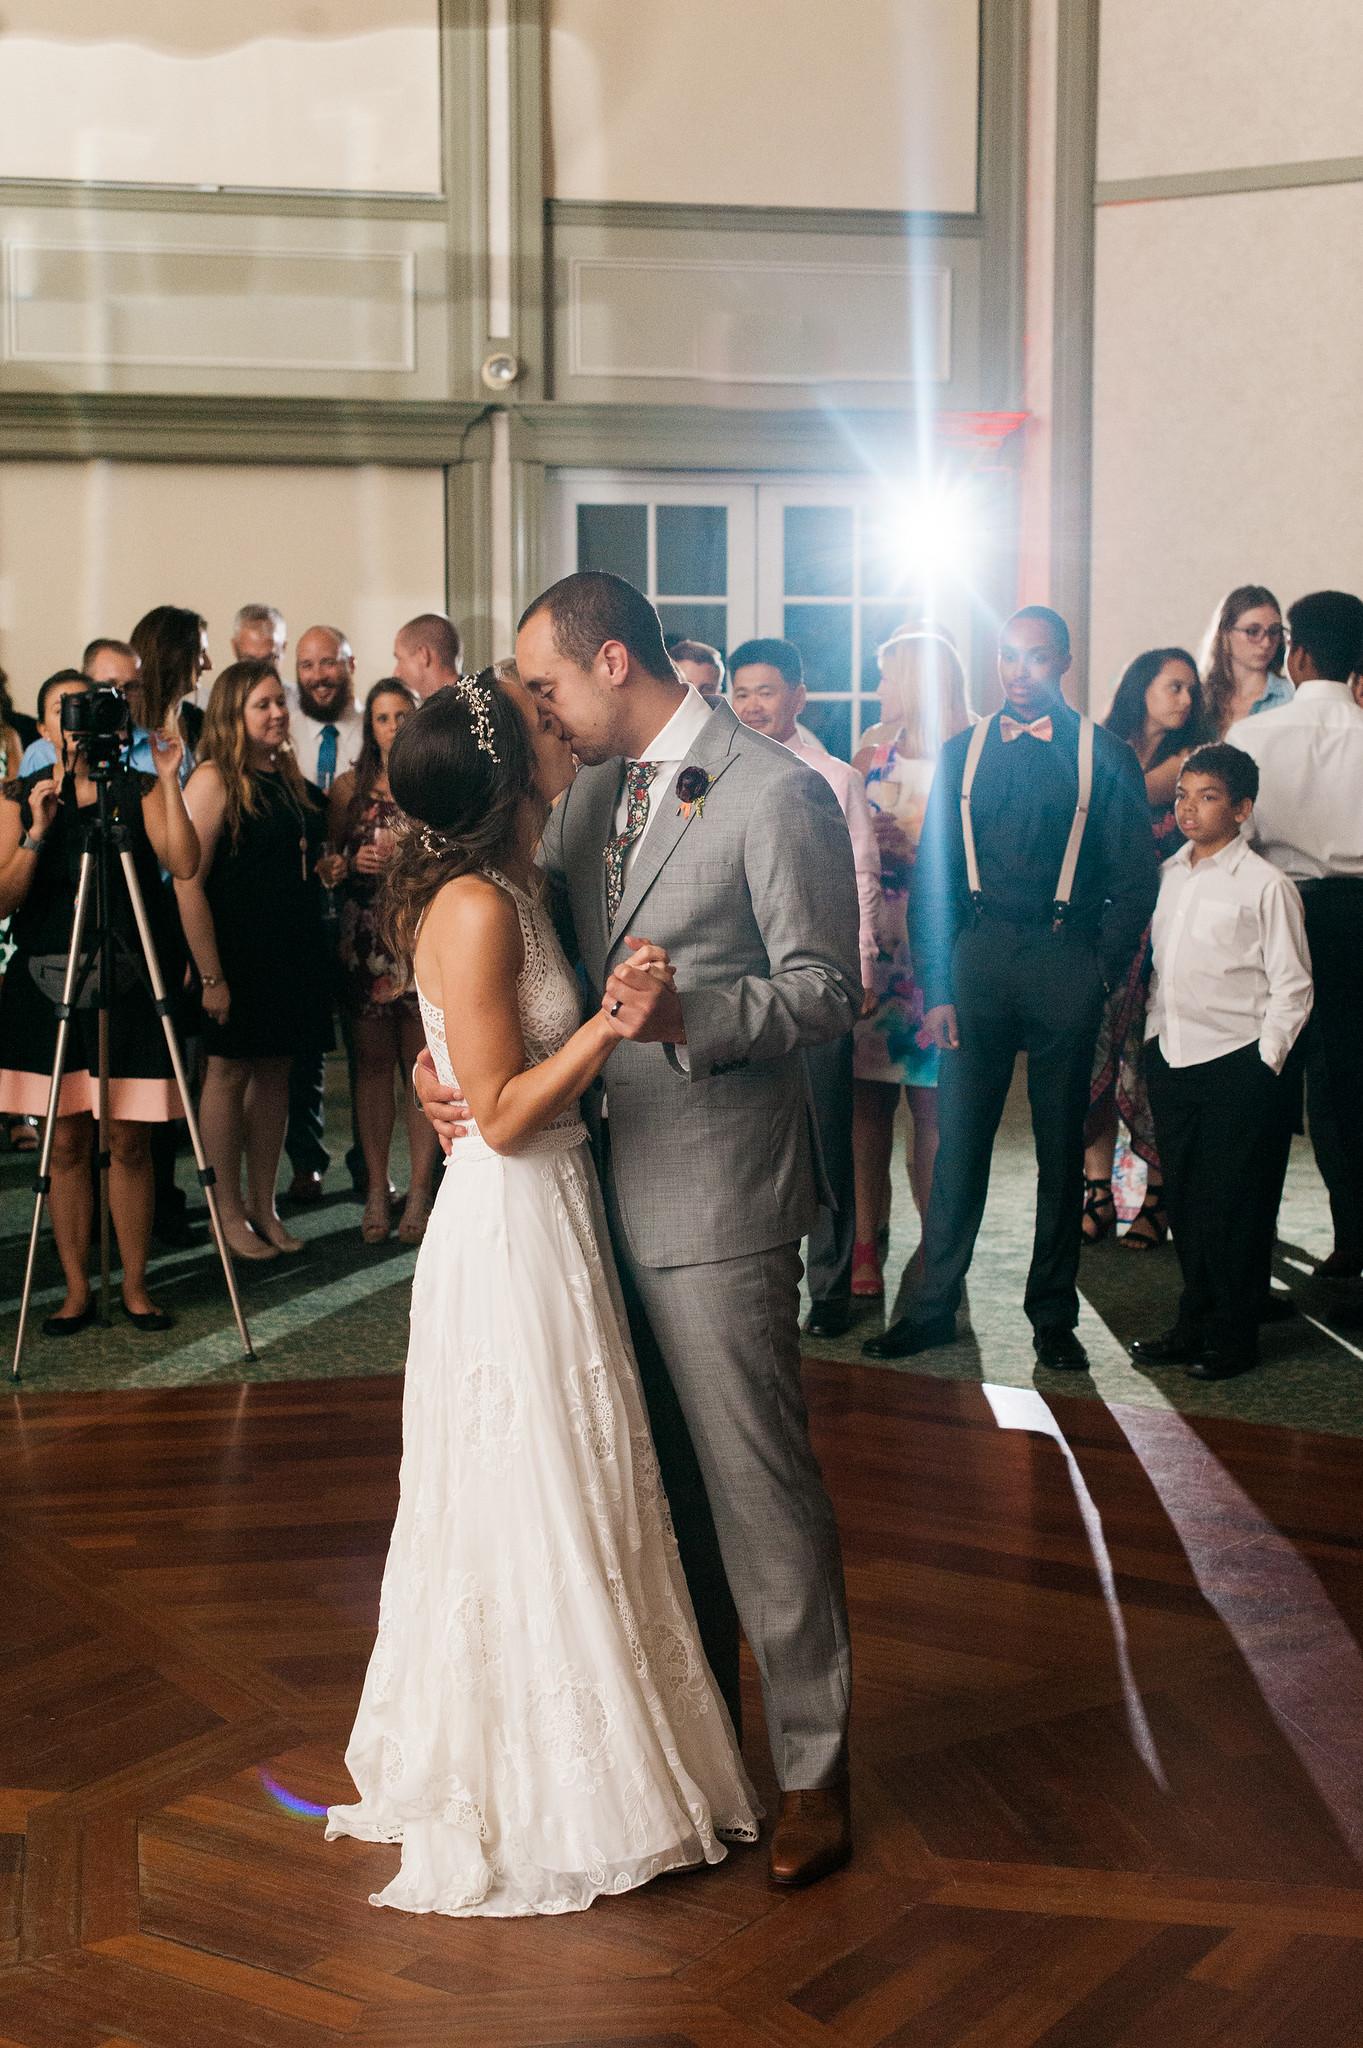 thomas-wedding-478-X4.jpg